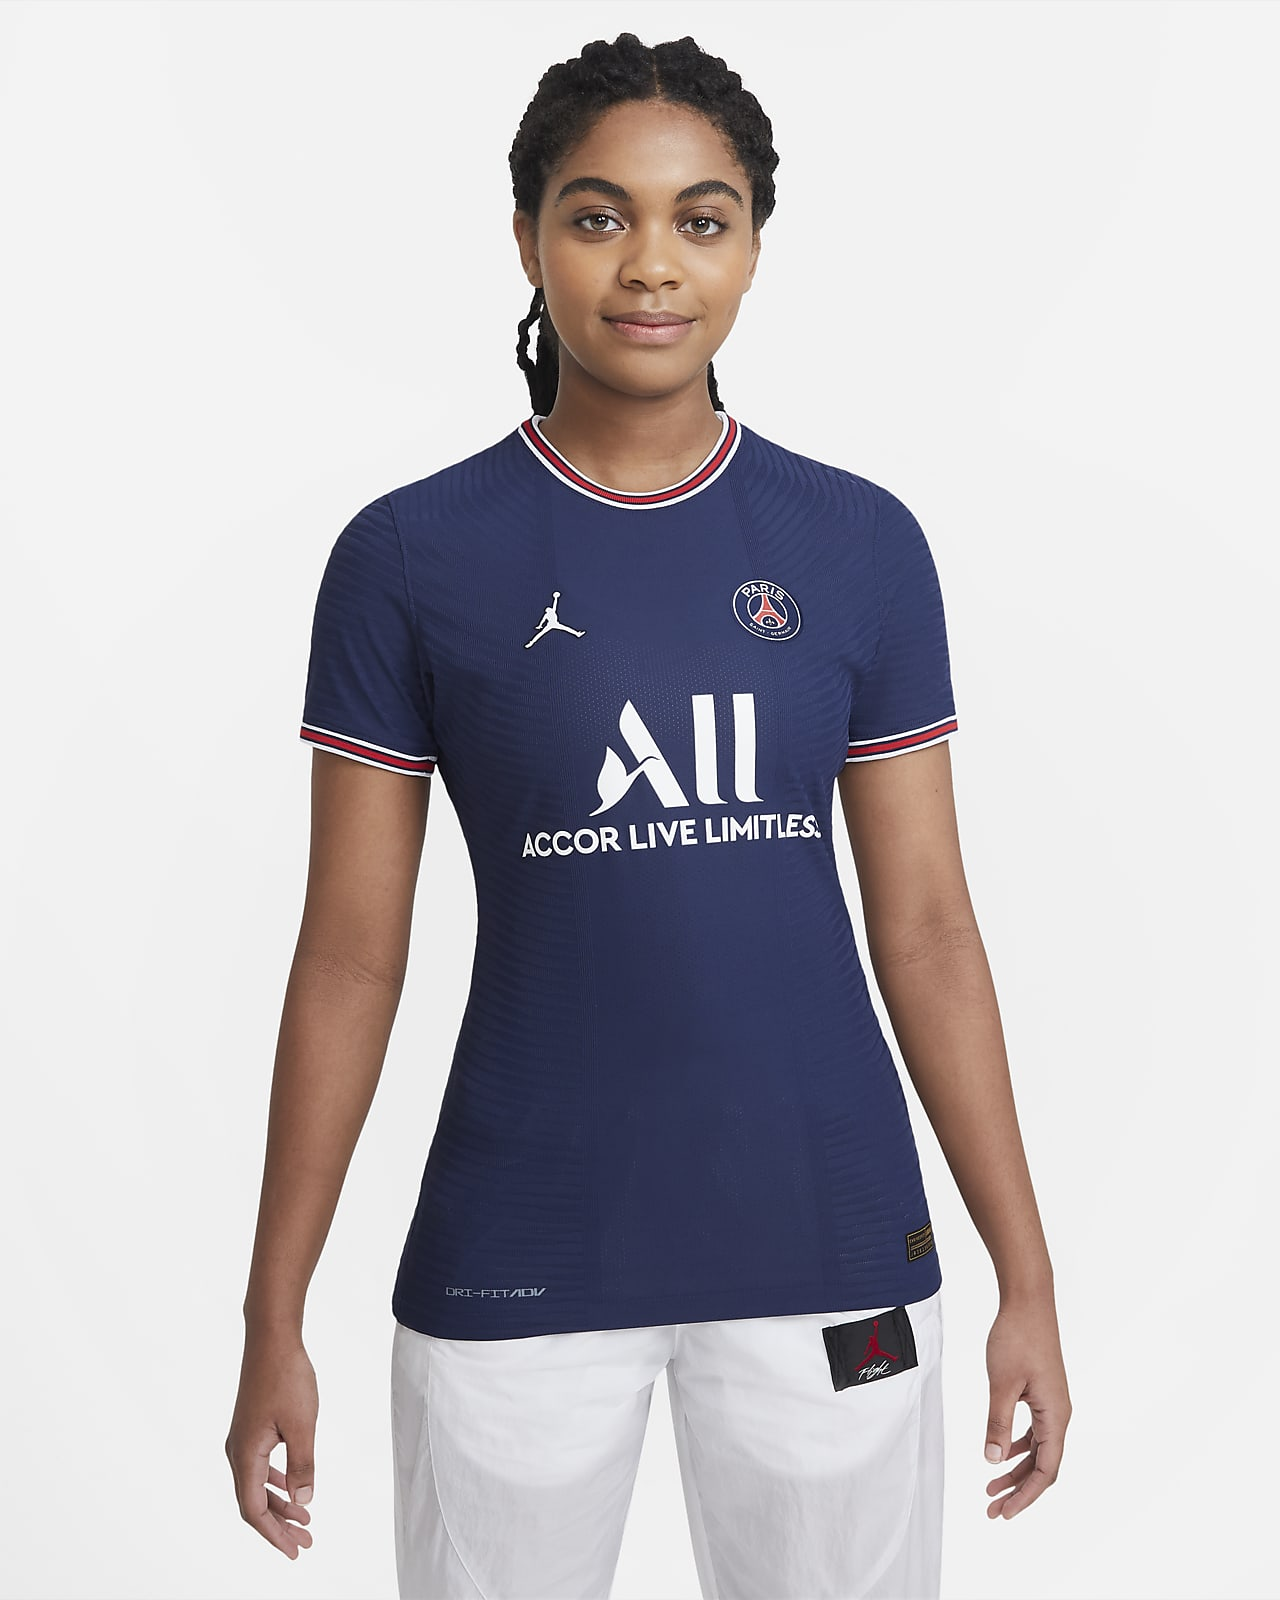 Paris Saint-Germain 2021/22 Match Home Women's Nike Dri-FIT ADV Football Shirt